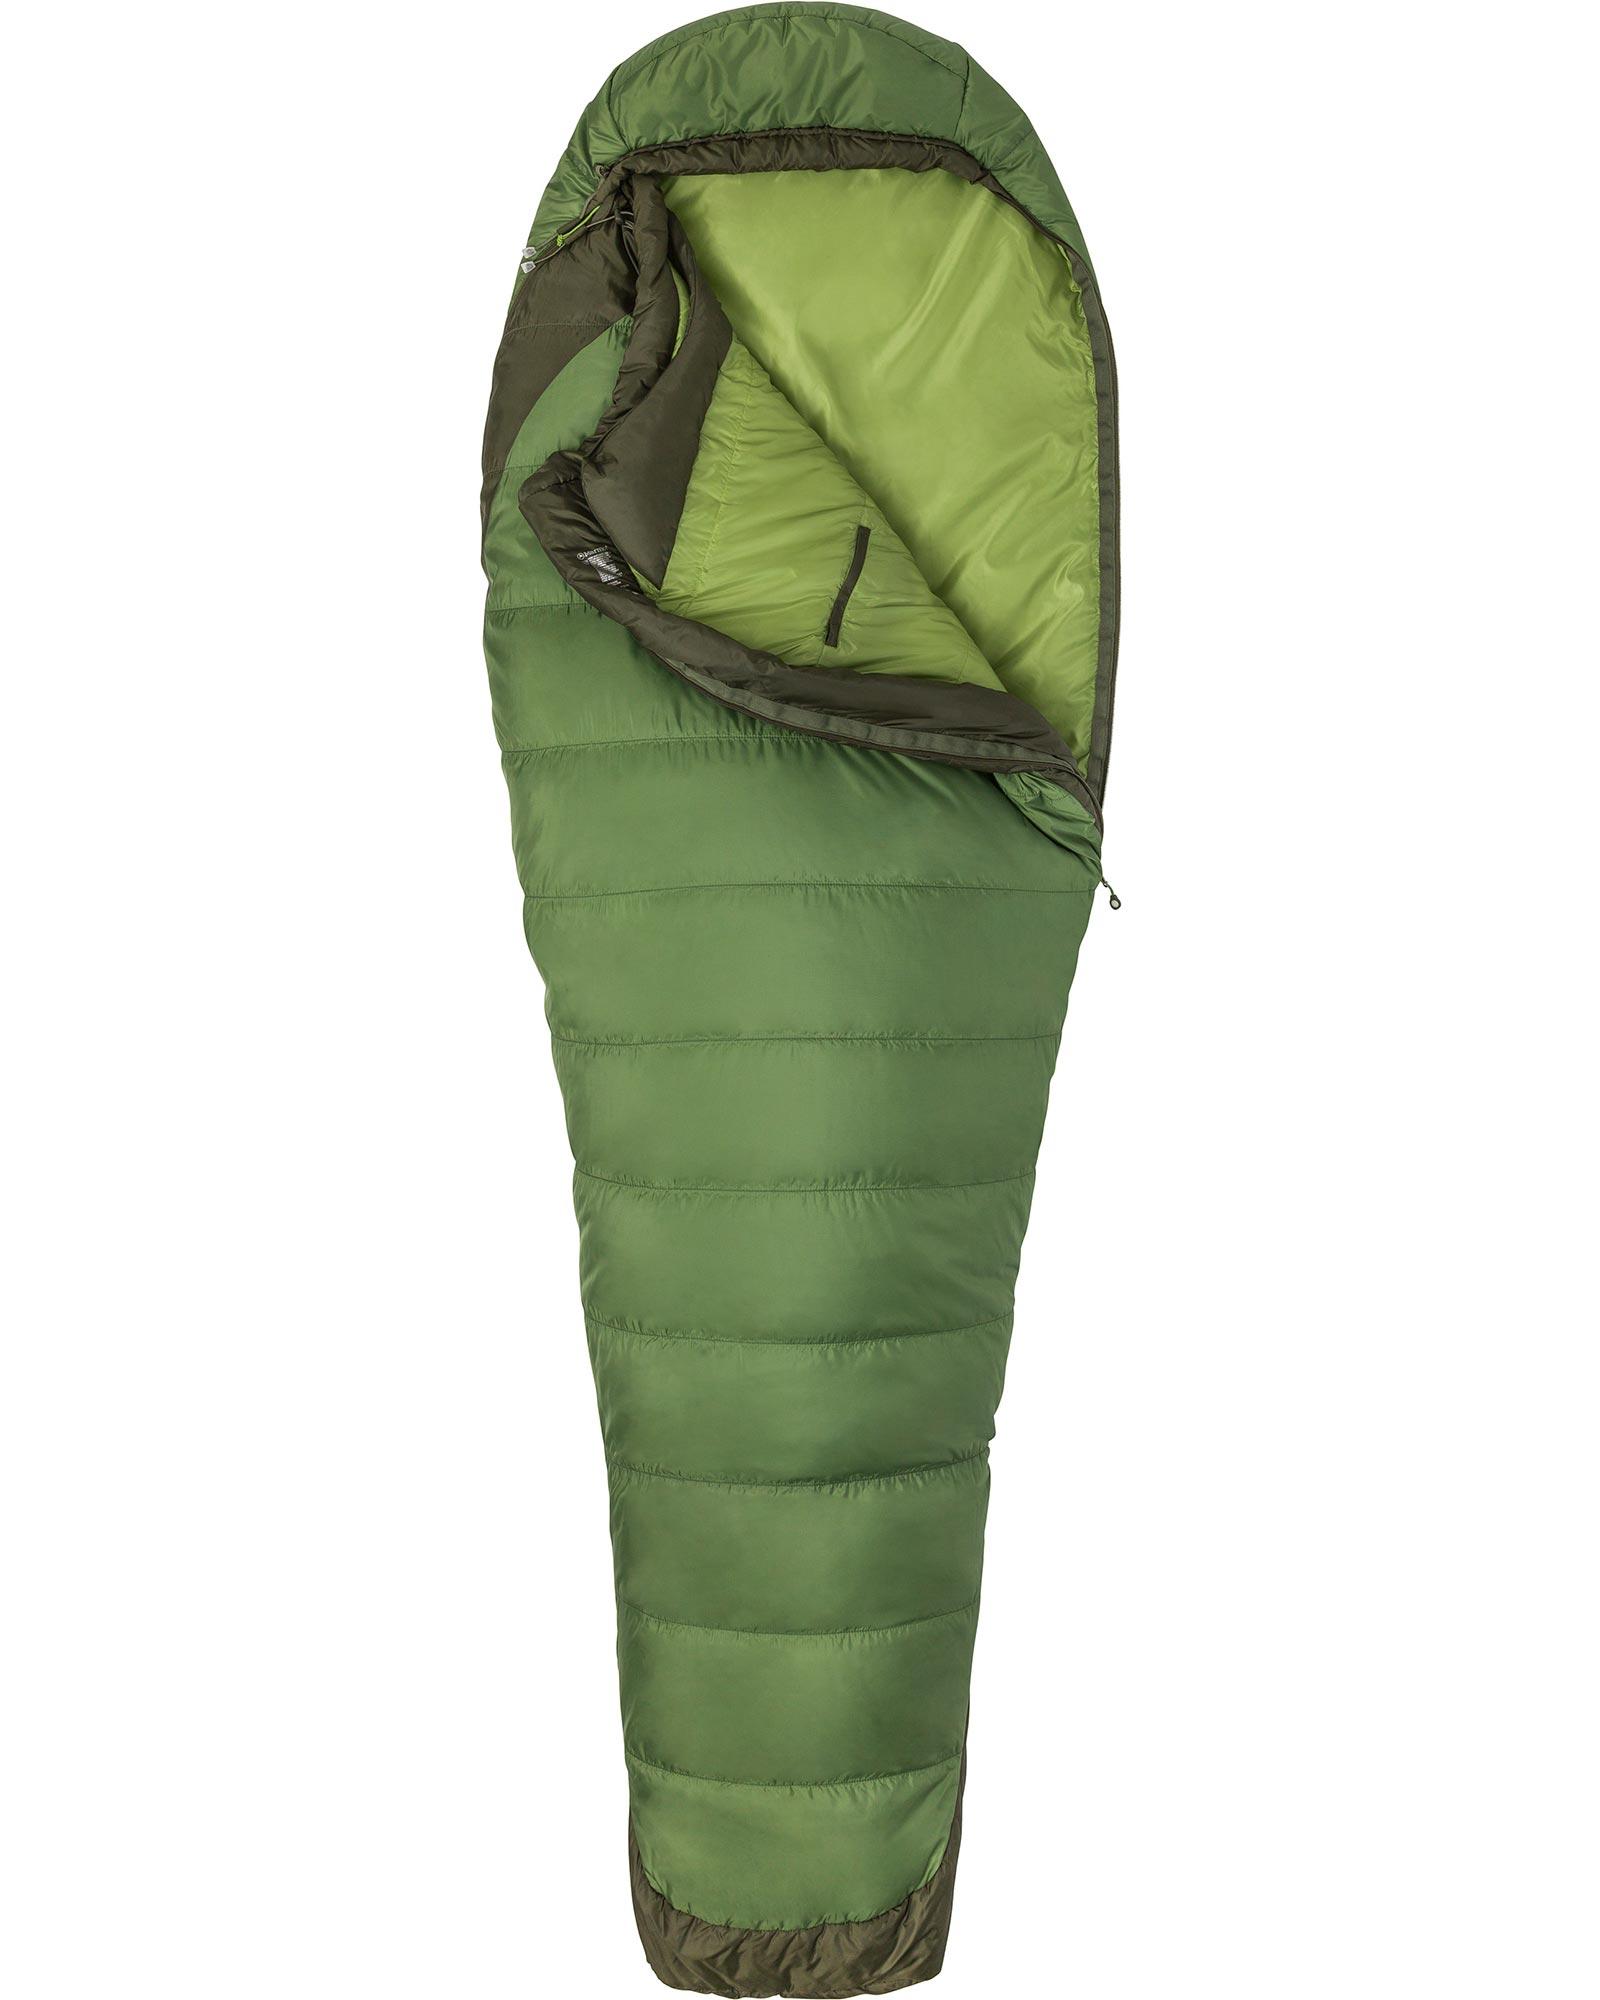 Marmot Trestles Elite Eco 30 Long Sleeping Bag 0